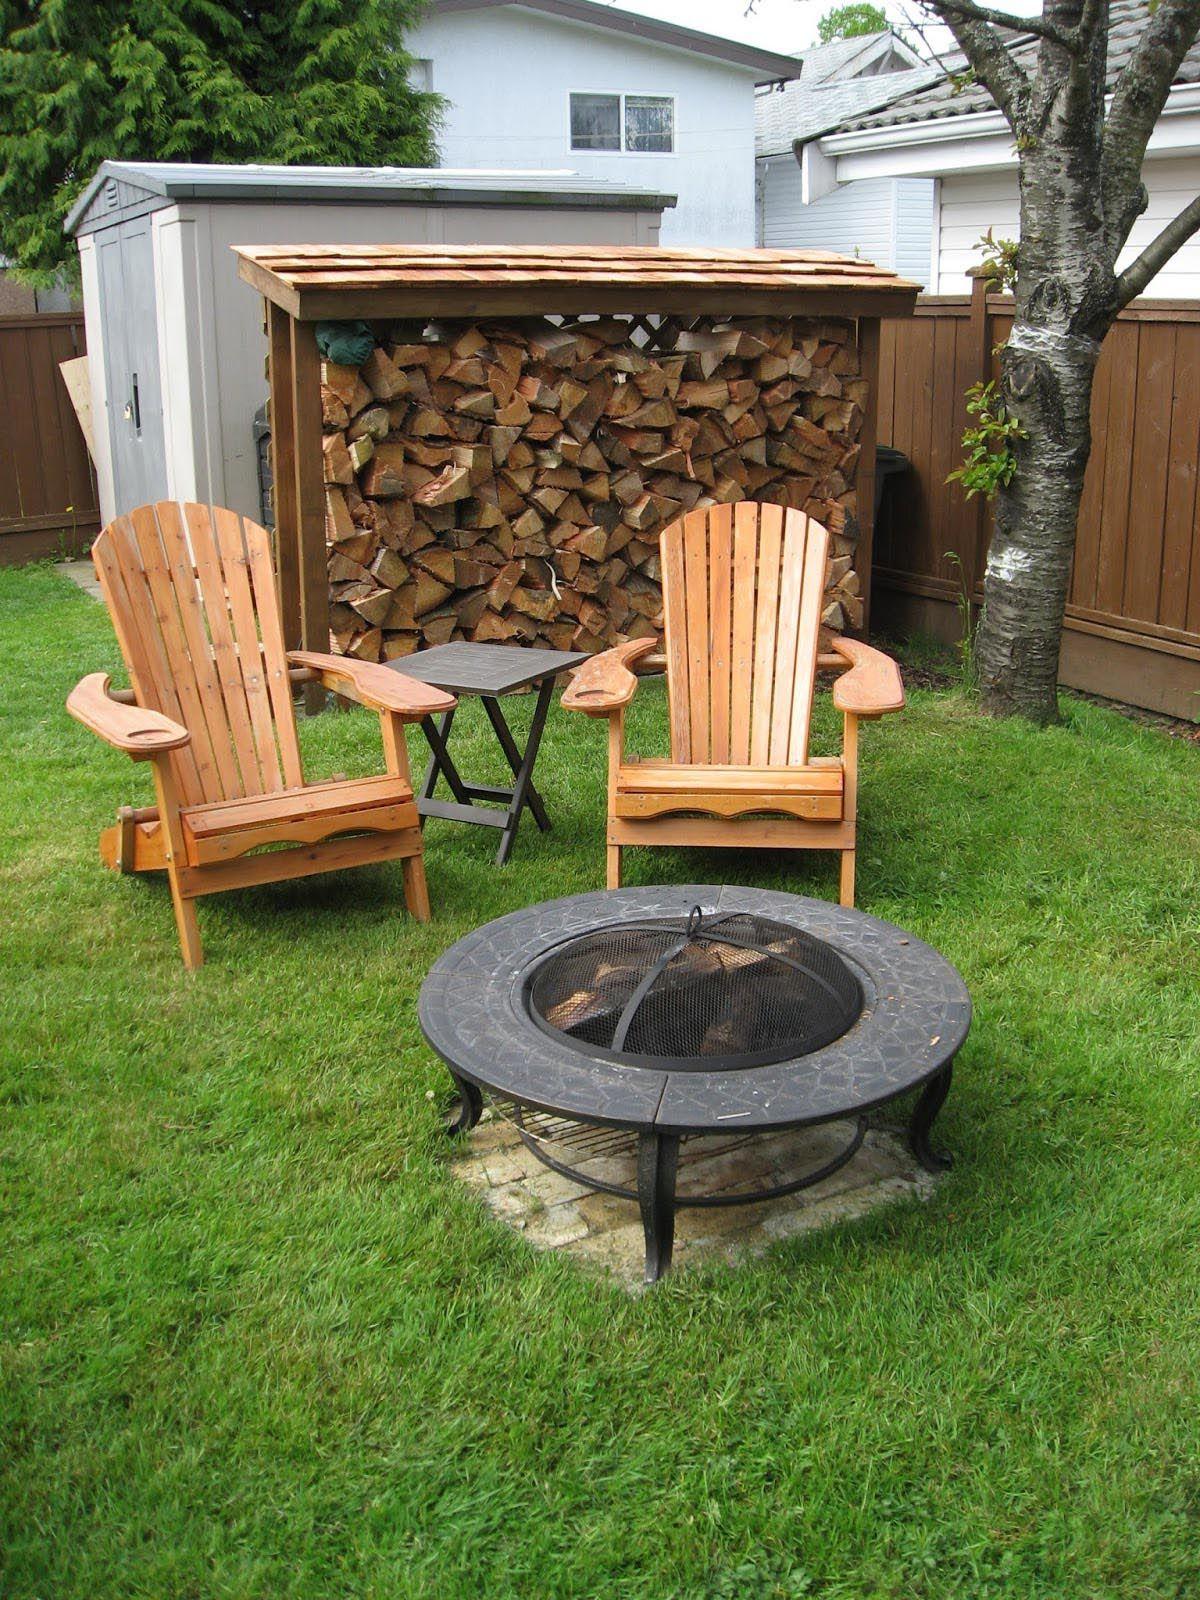 Fire Pit Pad For Grass Fire Pit Backyard Backyard Fire Cheap Fire Pit